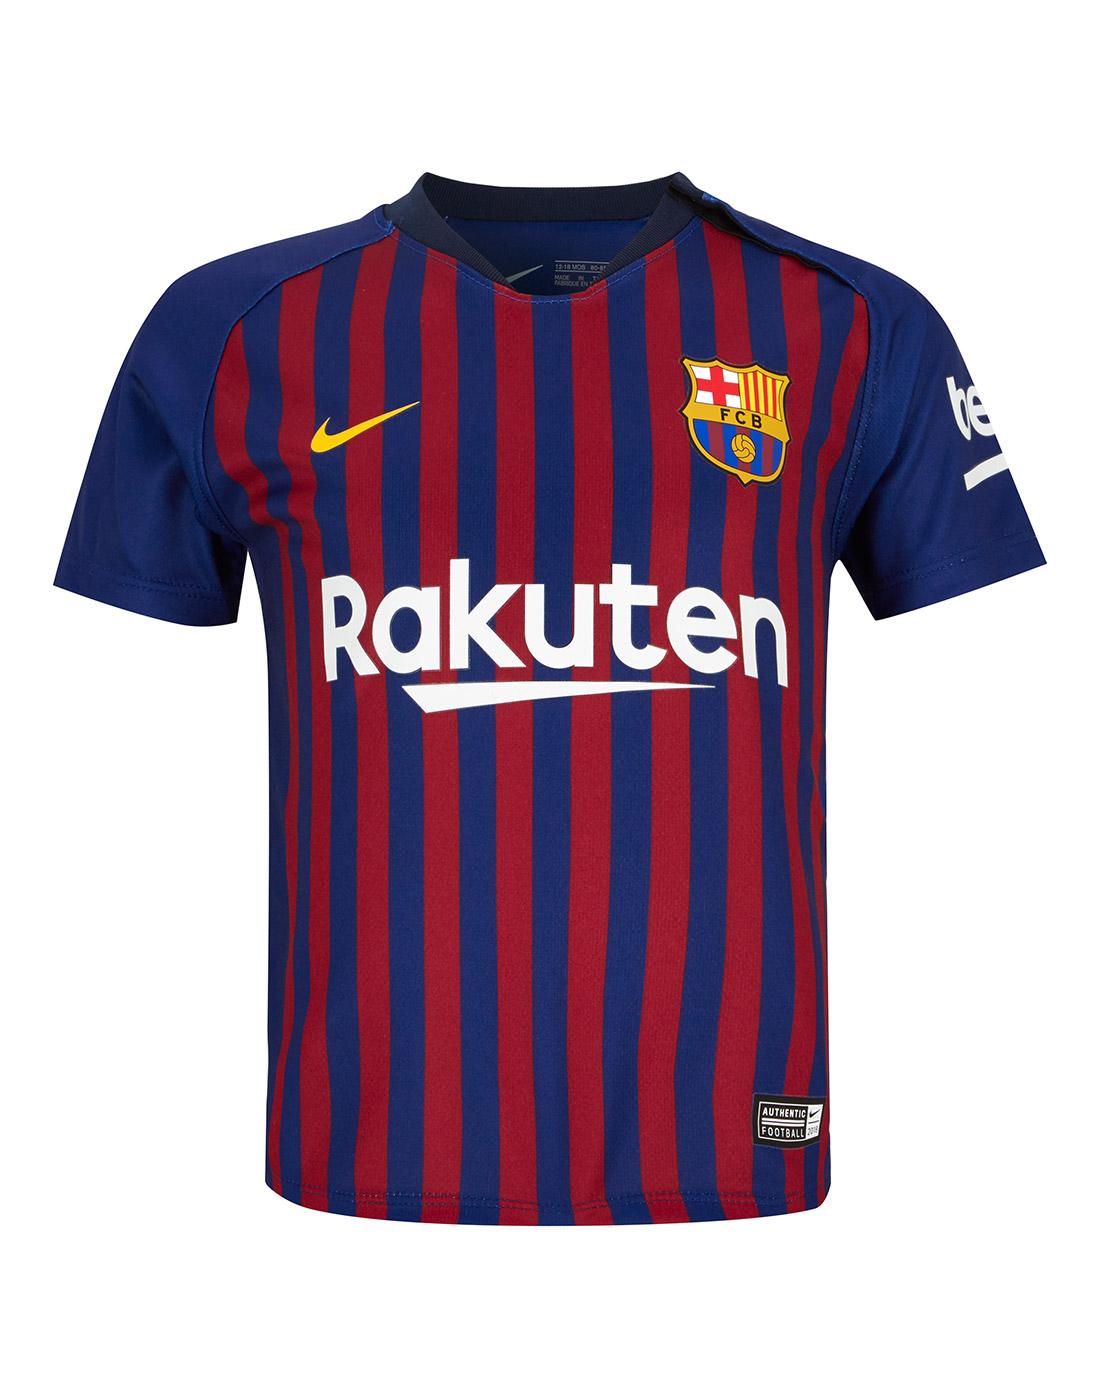 promo code acdfe 8eea9 Nike Infants Barcelona 18/19 Home Kit